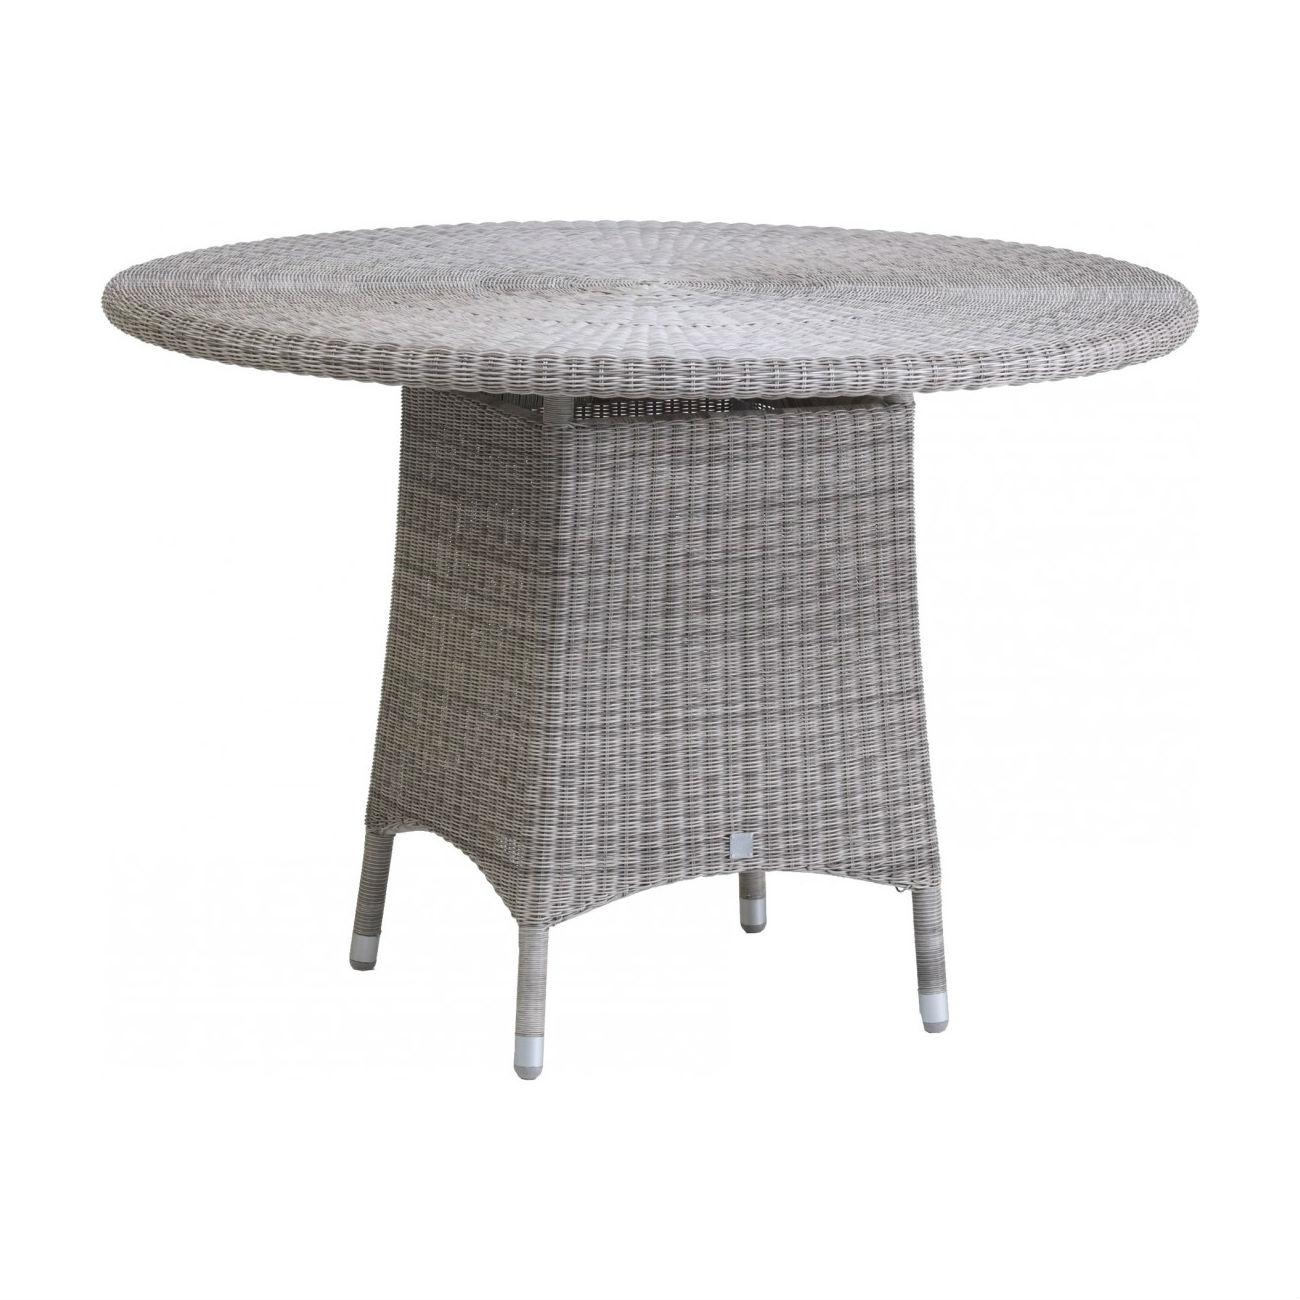 table de jardin ronde diametre 110 cm en resine tressee